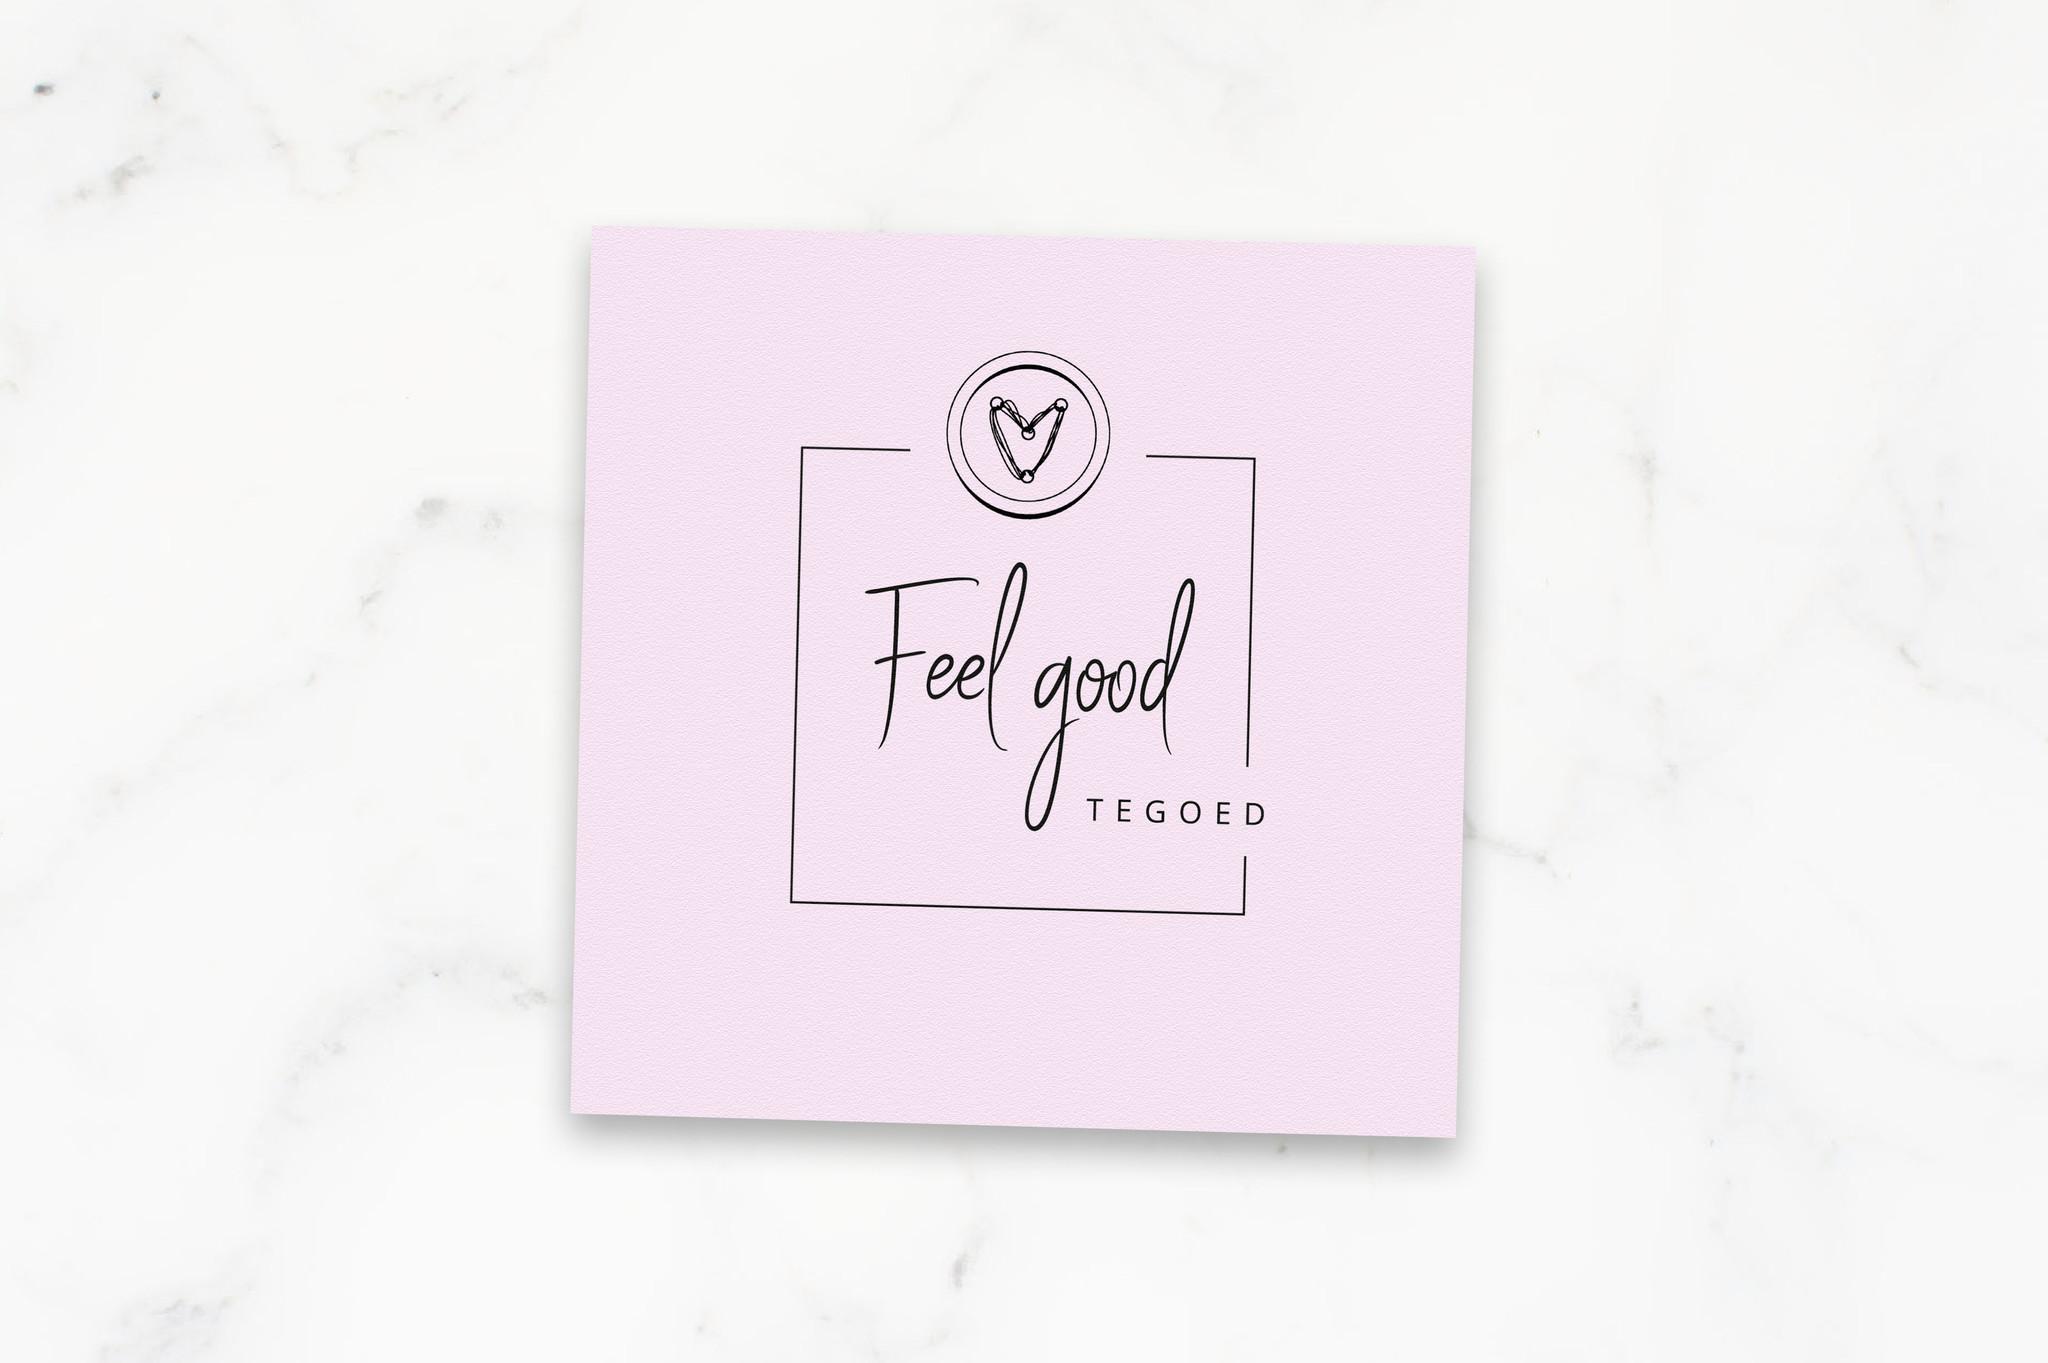 Feel Good Tegoed 'n je mailbox' 35 euro